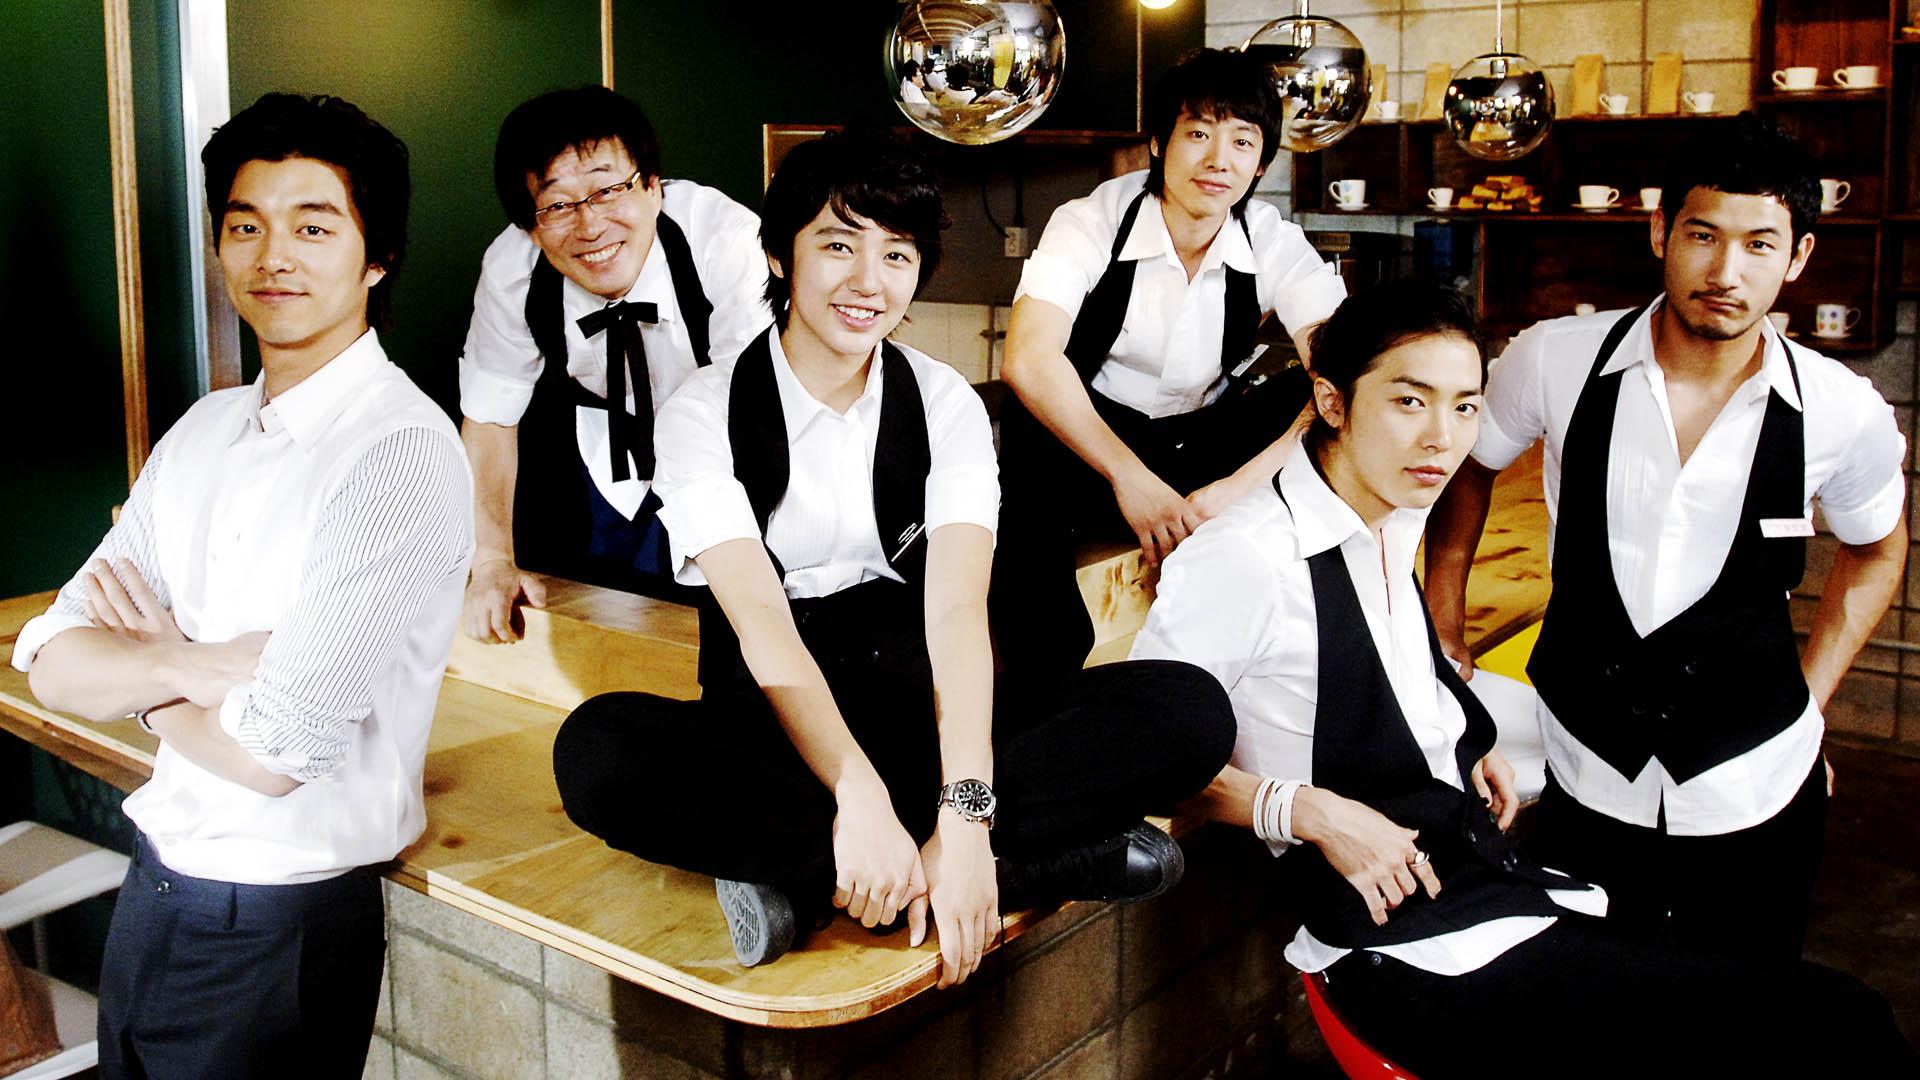 Coffee Prince - Korean Dramas Wallpaper (33103042) - Fanpop